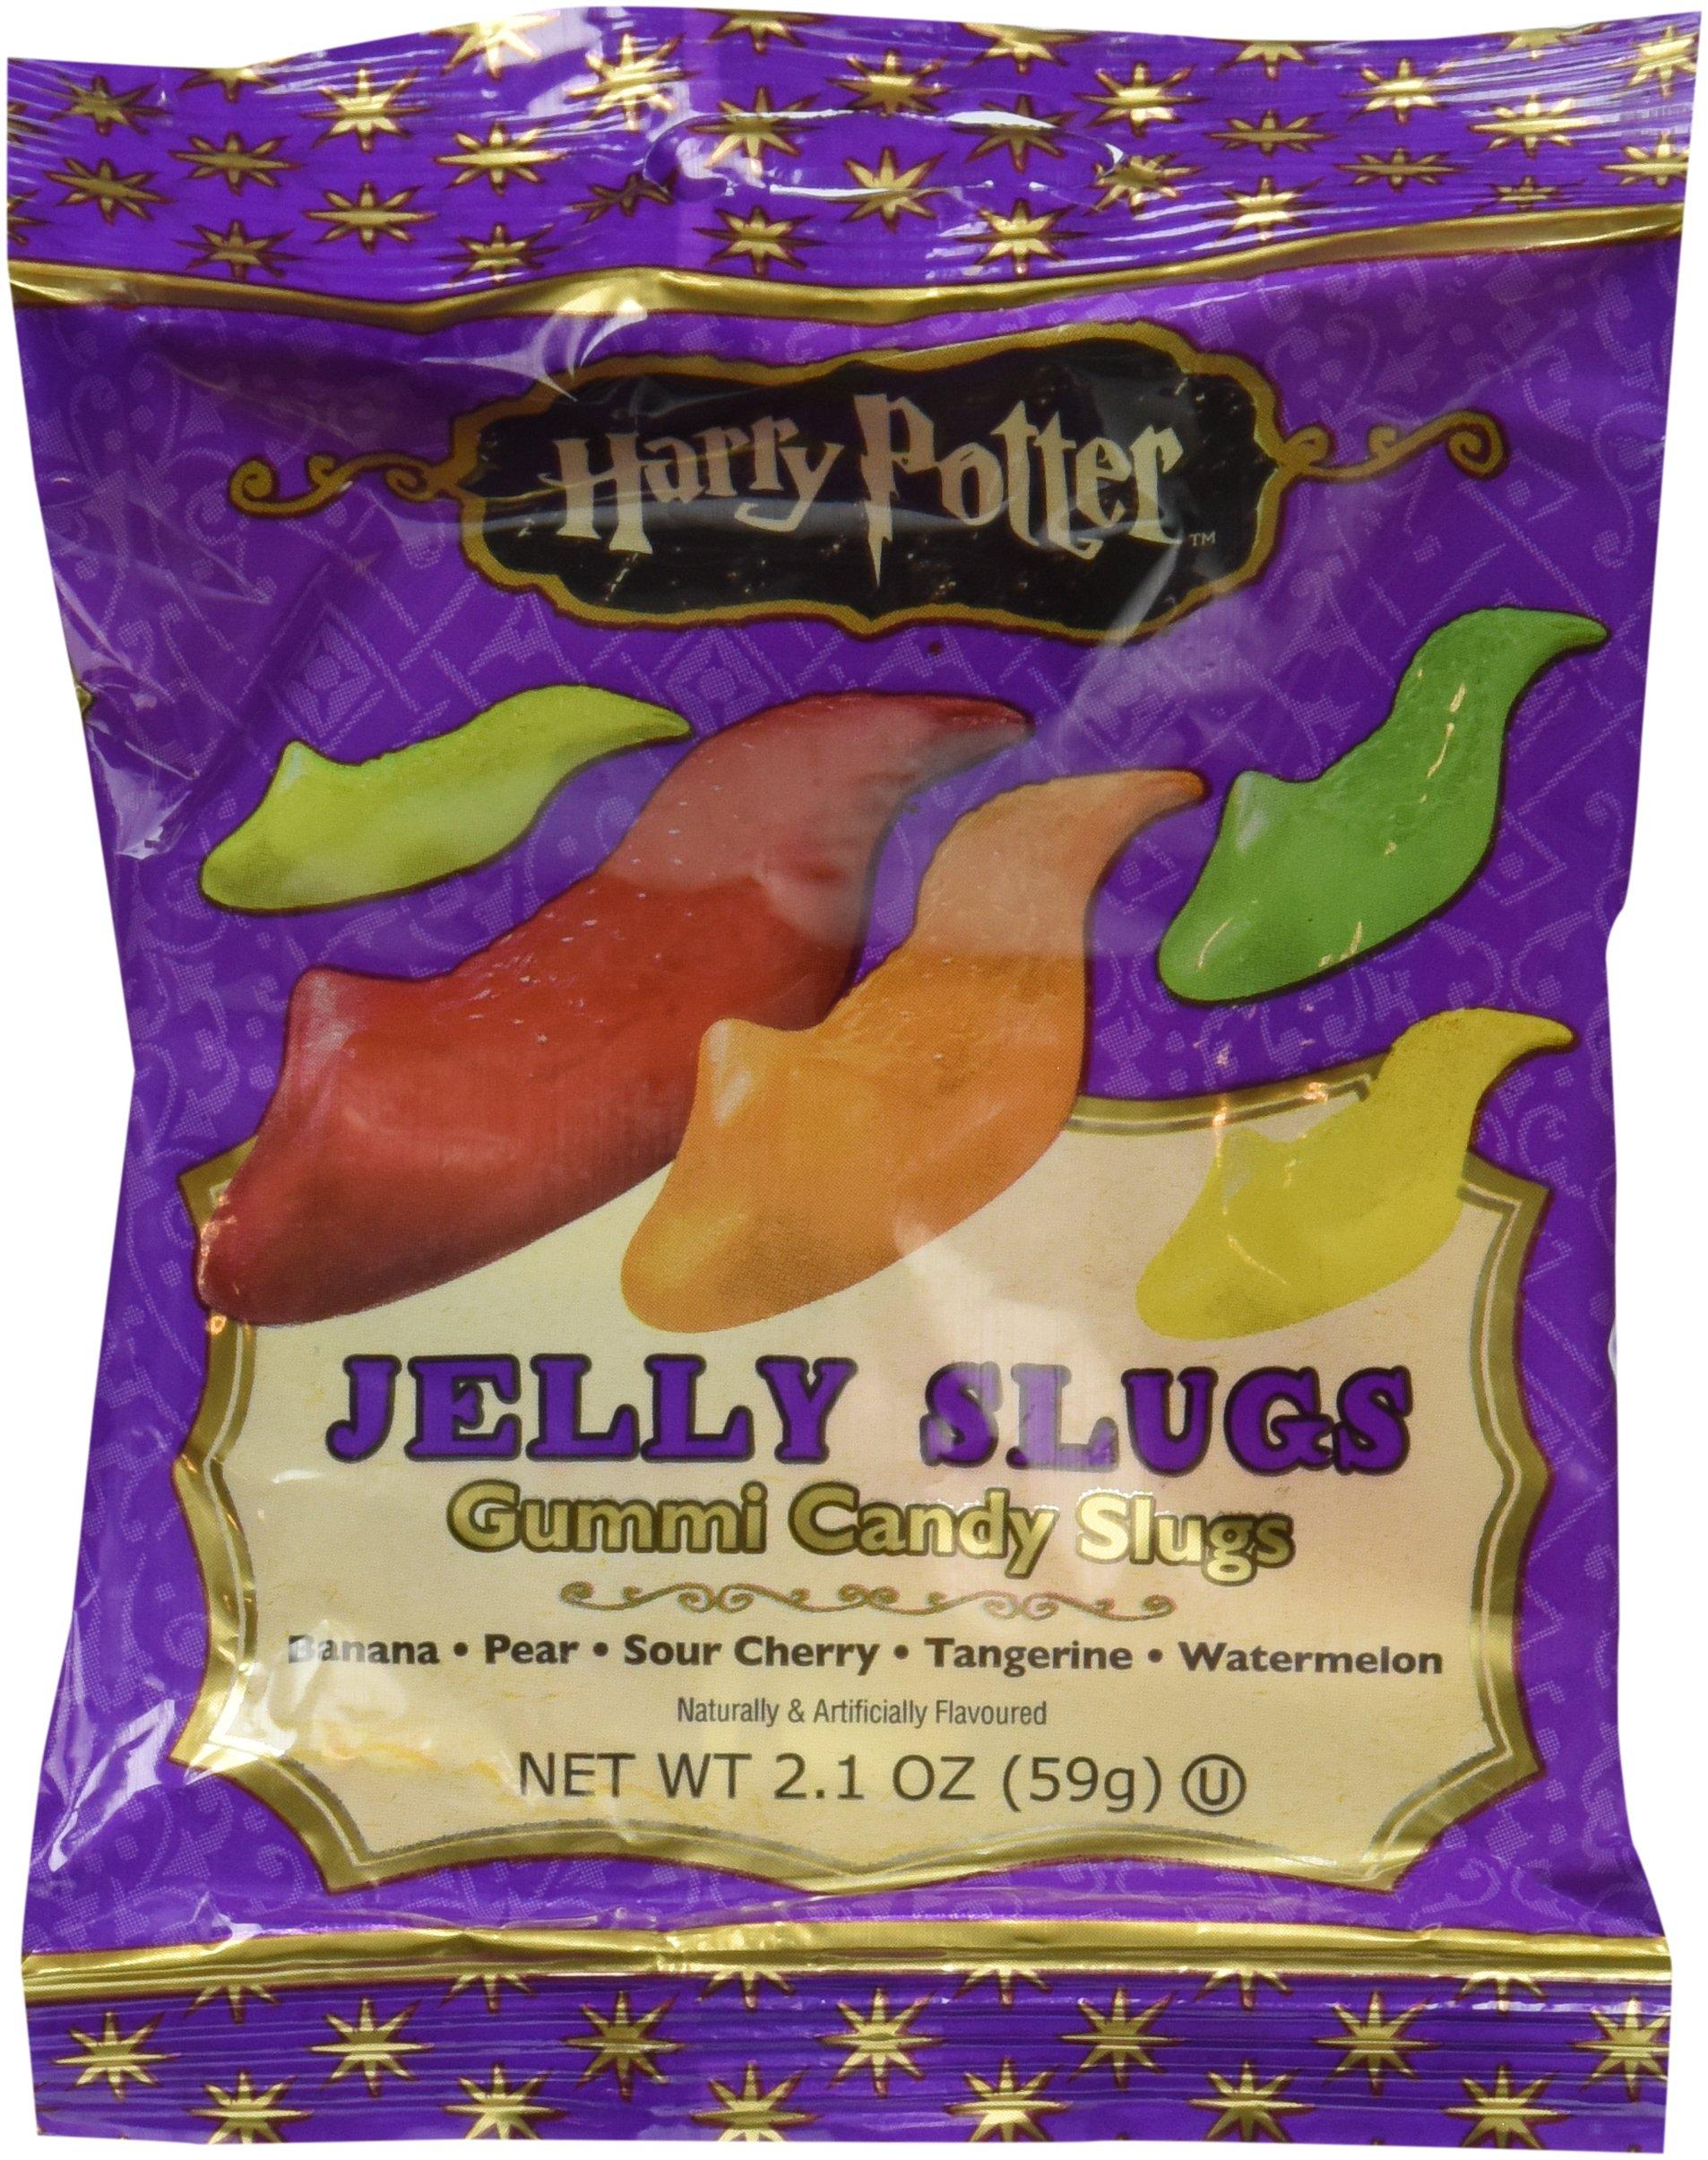 Harry Potter™ Jelly Slugs - 2.1 oz Bag - 6 Pack